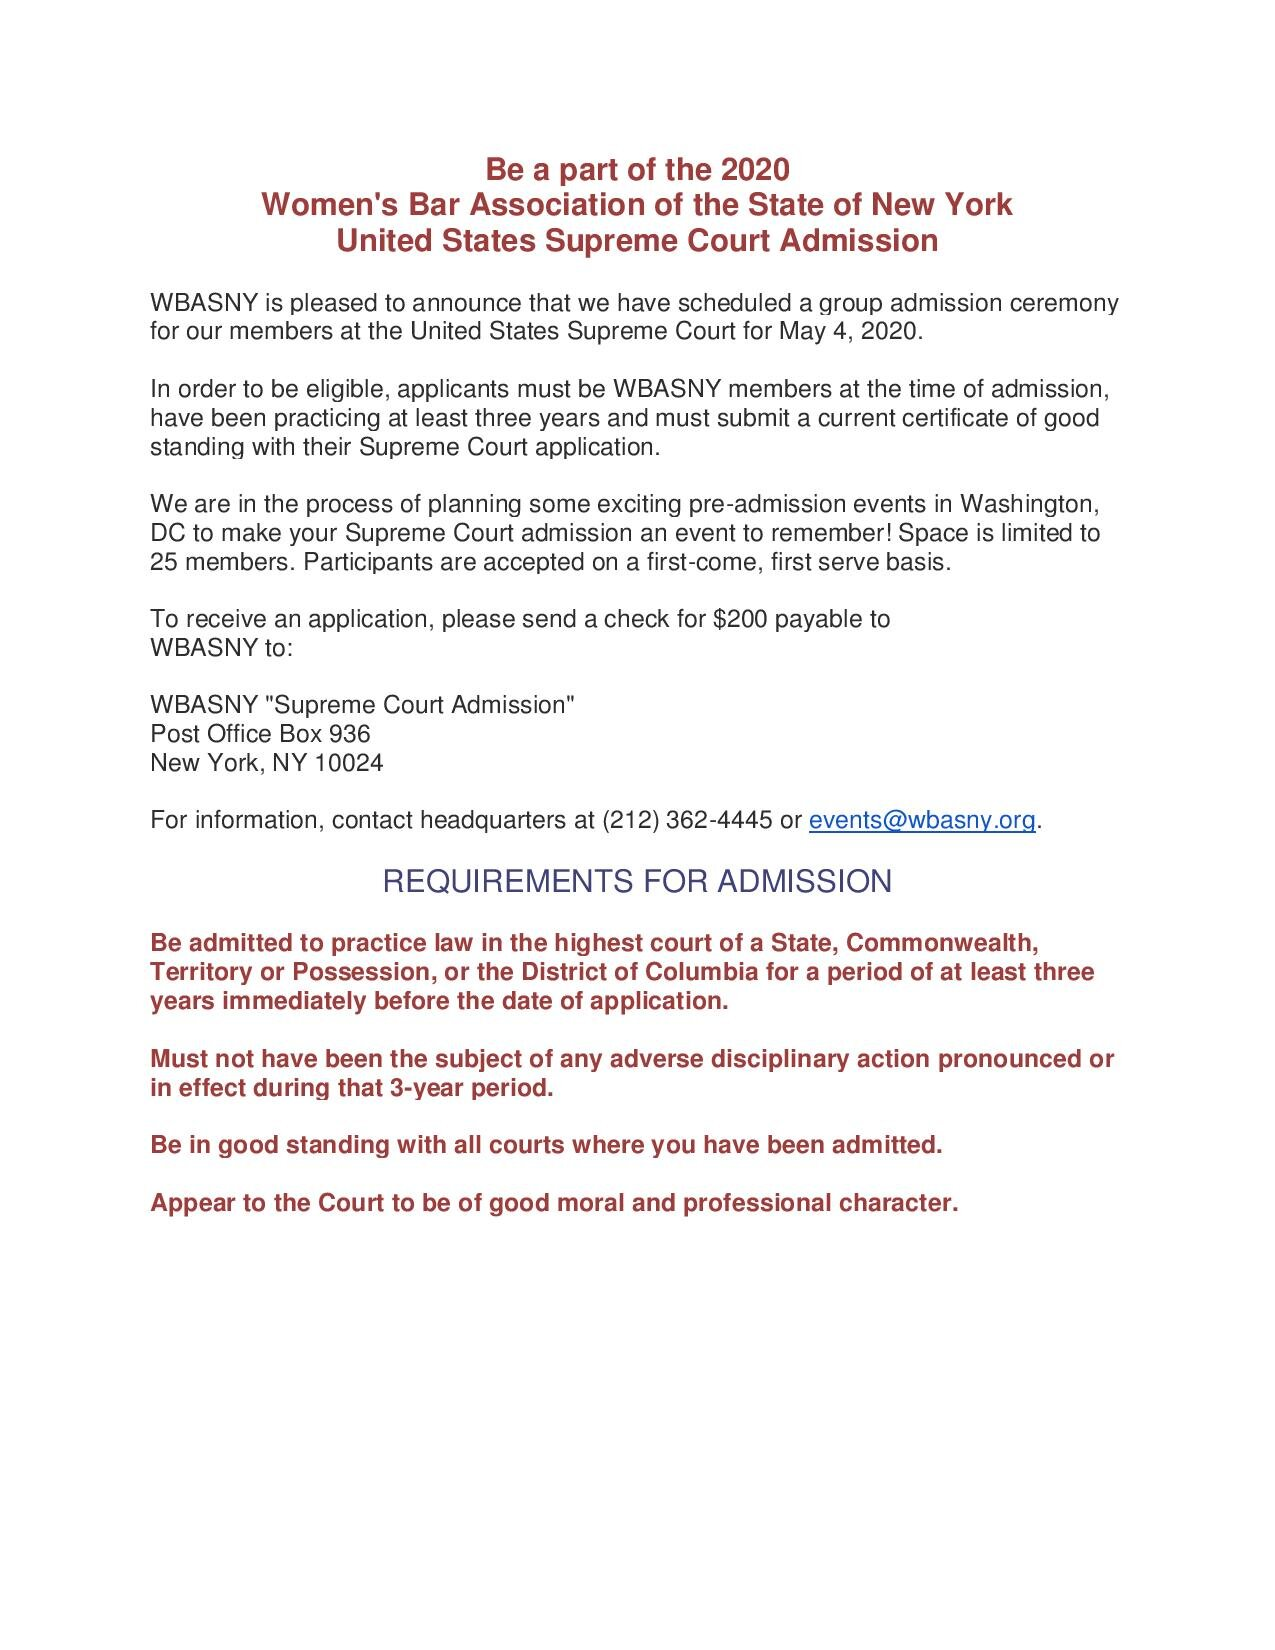 WBASNY Sup Ct Admission 2020-page-001.jpg